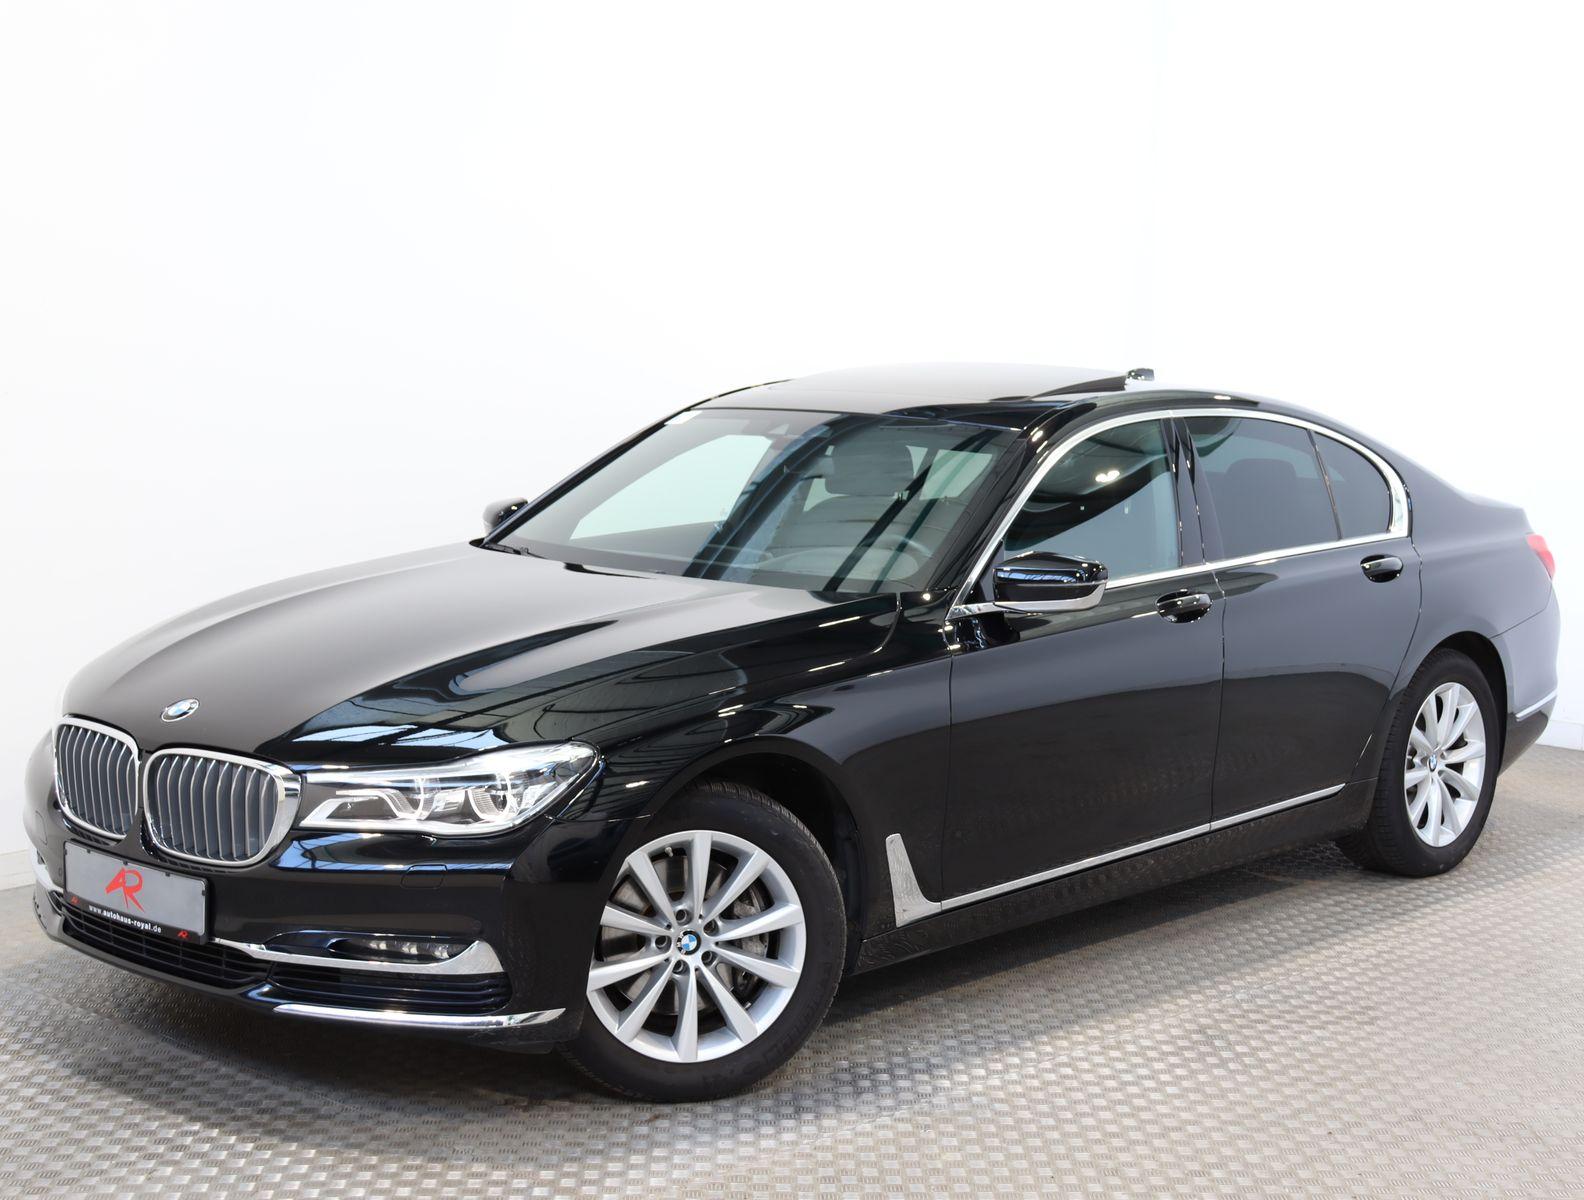 BMW 740 d xDrive DIGI.TACHO,MASSAGE,HEADUP,MEMORY,SH, Jahr 2016, Diesel